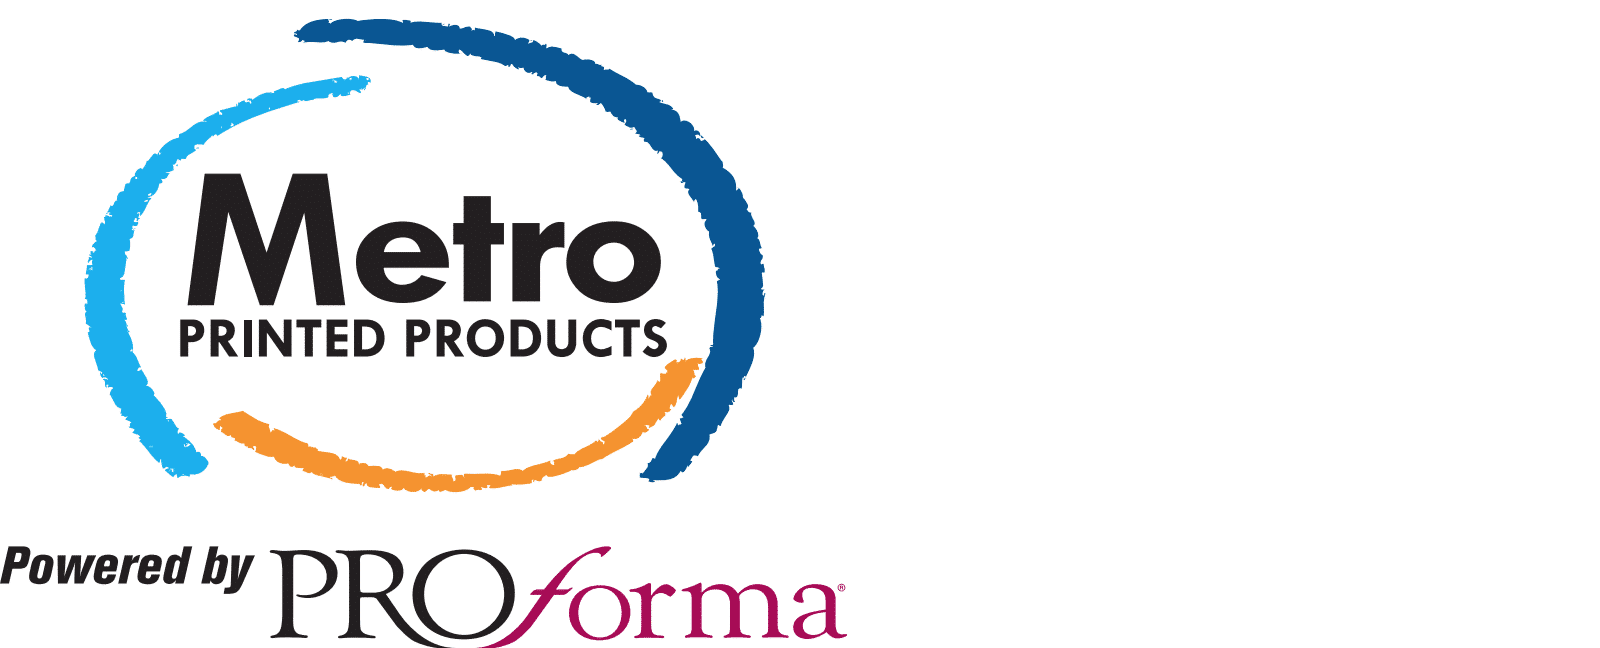 Metro Printed Products Logo